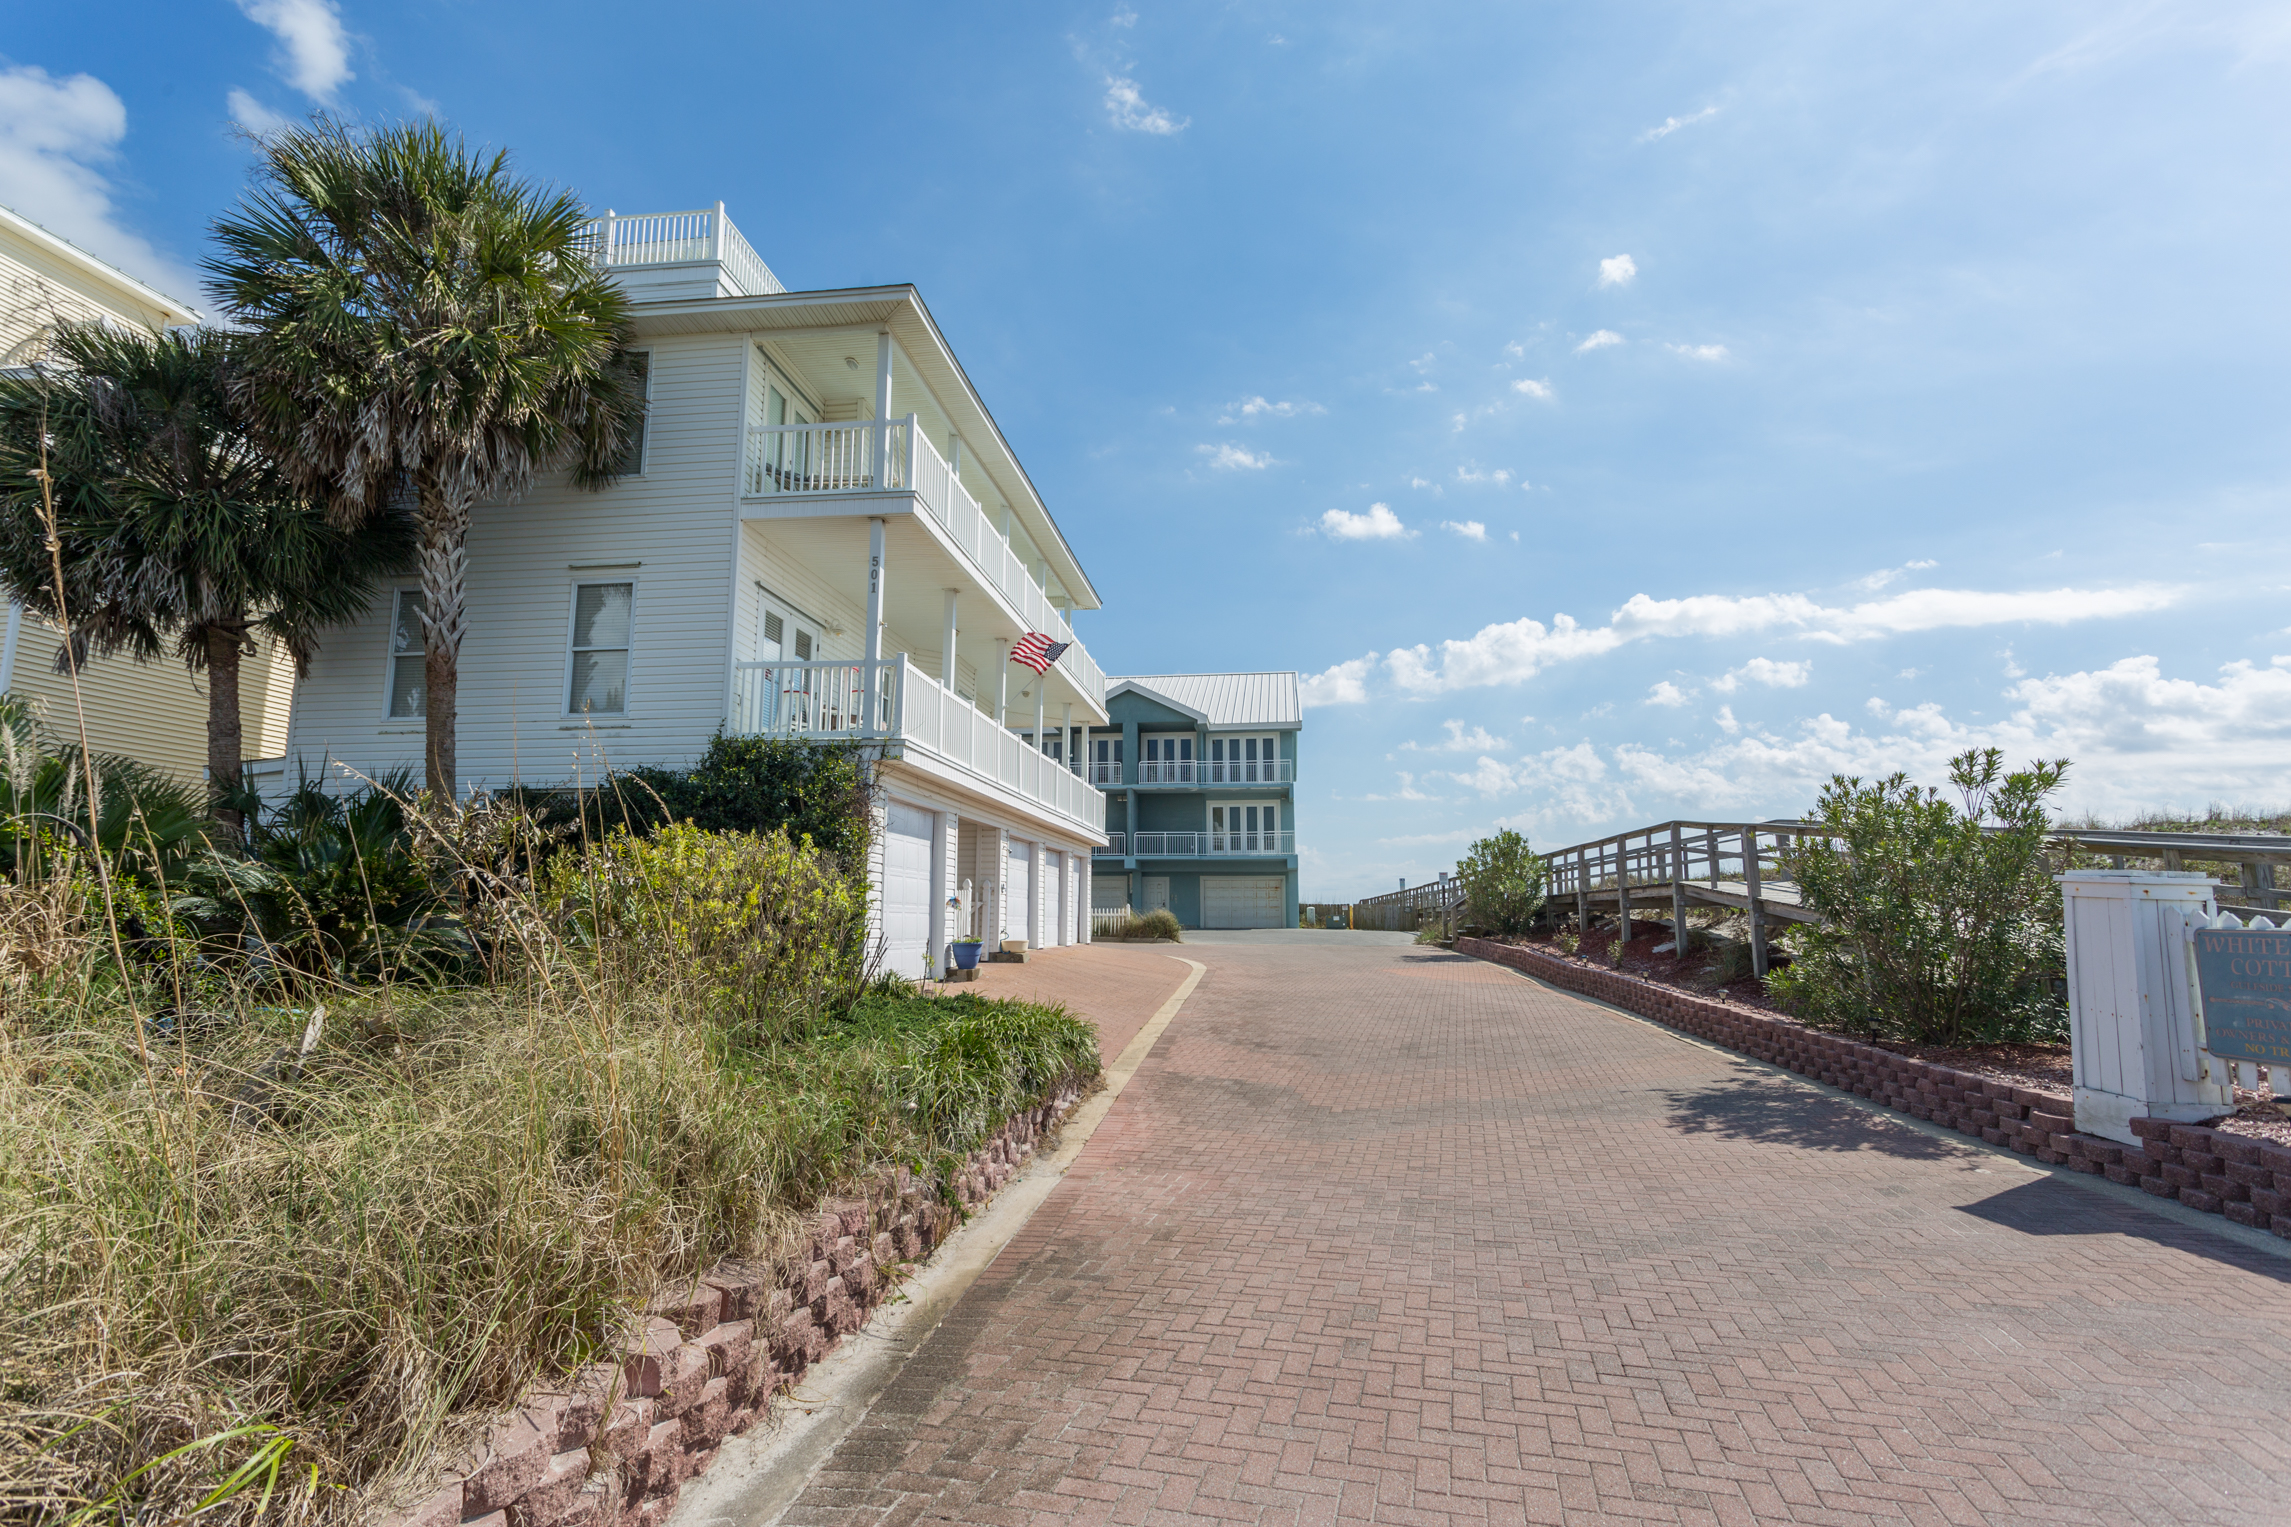 White Sands Cottage 501 Life's a Beach House Townhouse rental in White Sands Pensacola Beach in Pensacola Beach Florida - #46